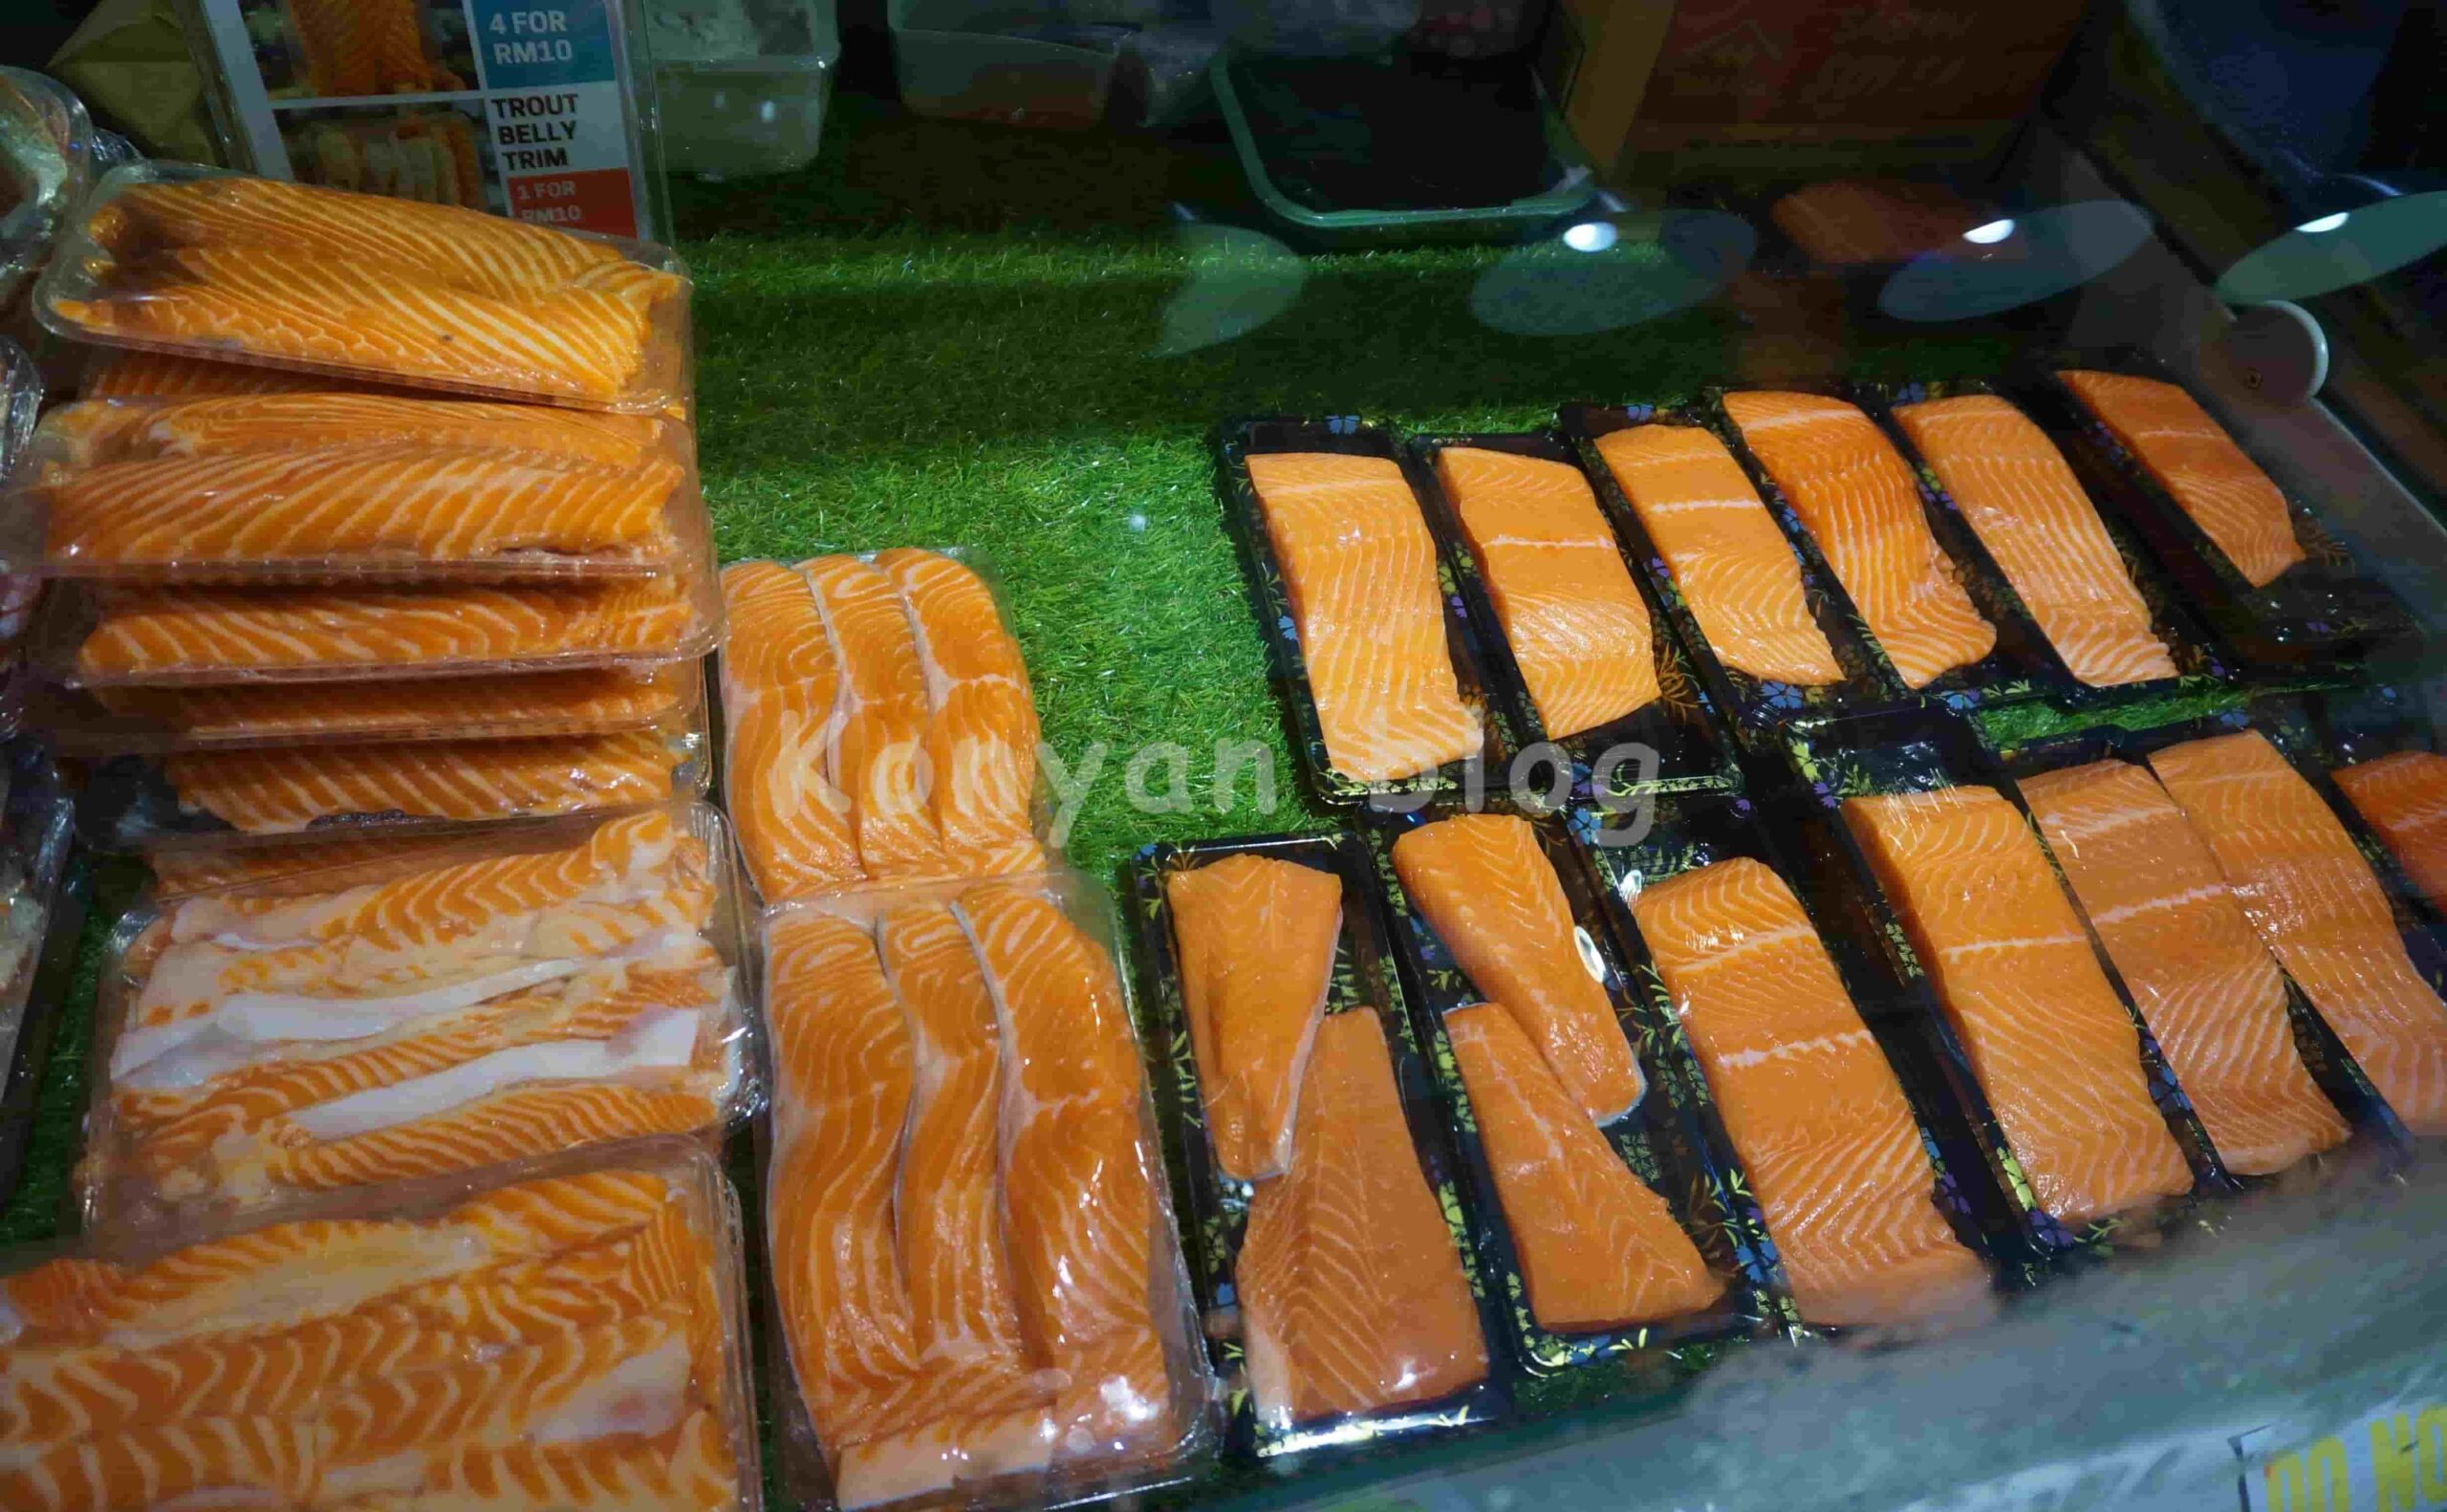 Top Catch Fisheries OUG 一頂魚屋 刺身 マレーシア KL OUG